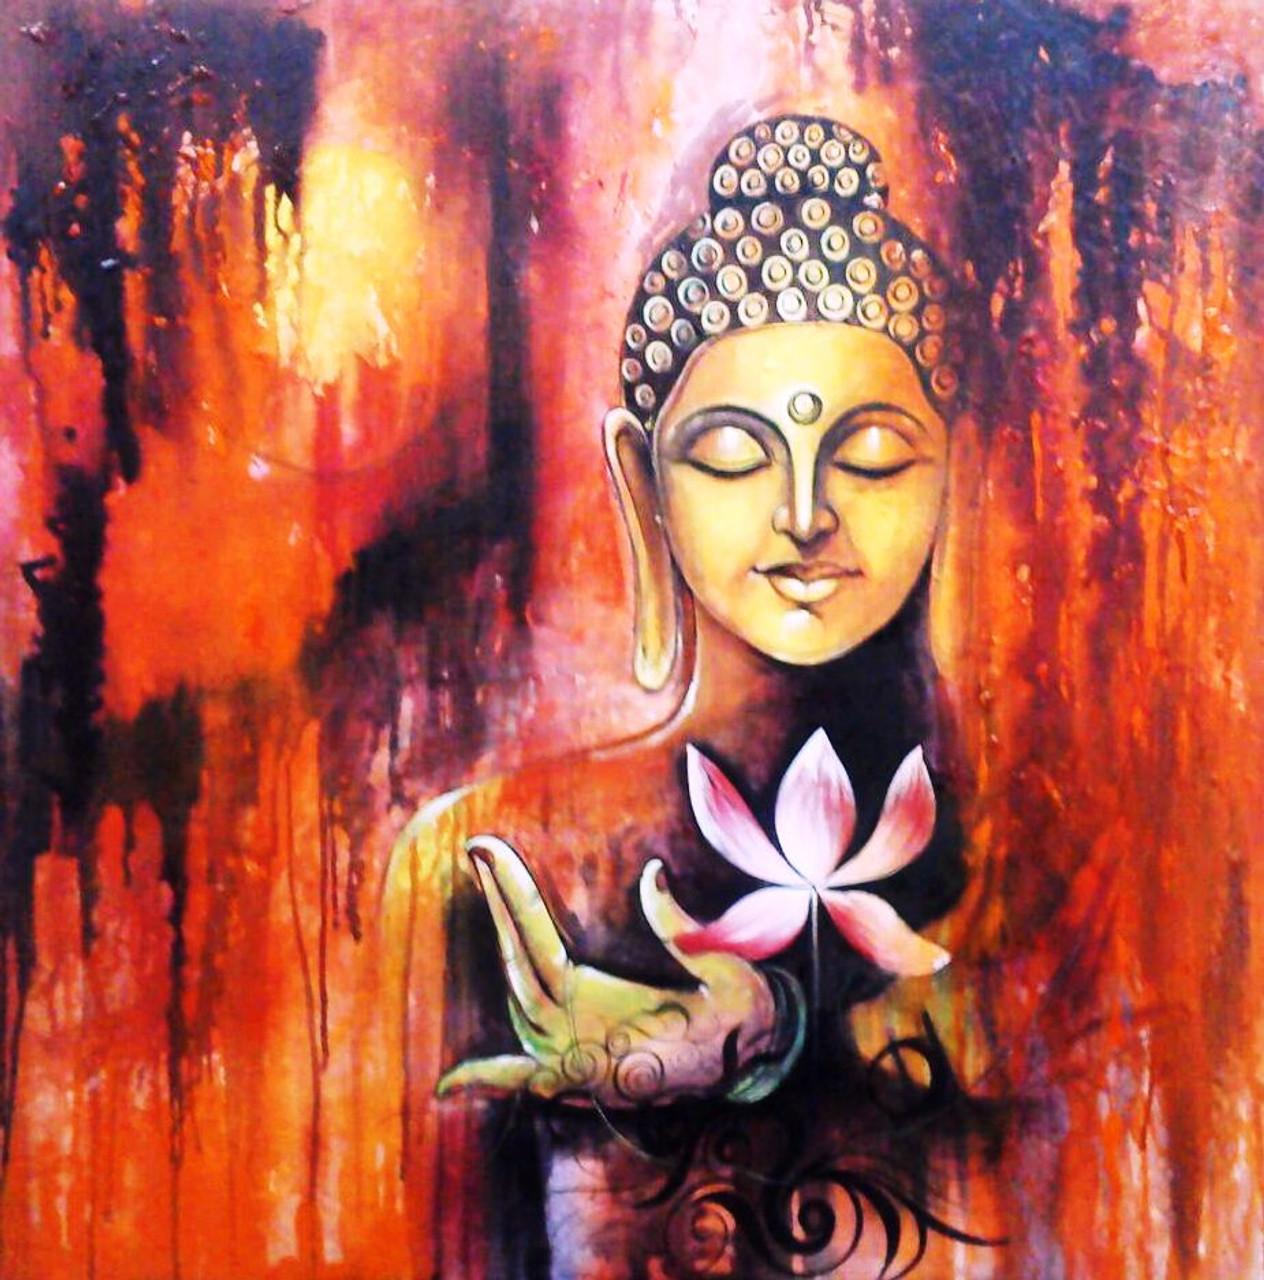 Buy Lotus Buddha Handmade Painting By Pallavi Jain Code Art 1229 2256 Paintings For Sale Online In India